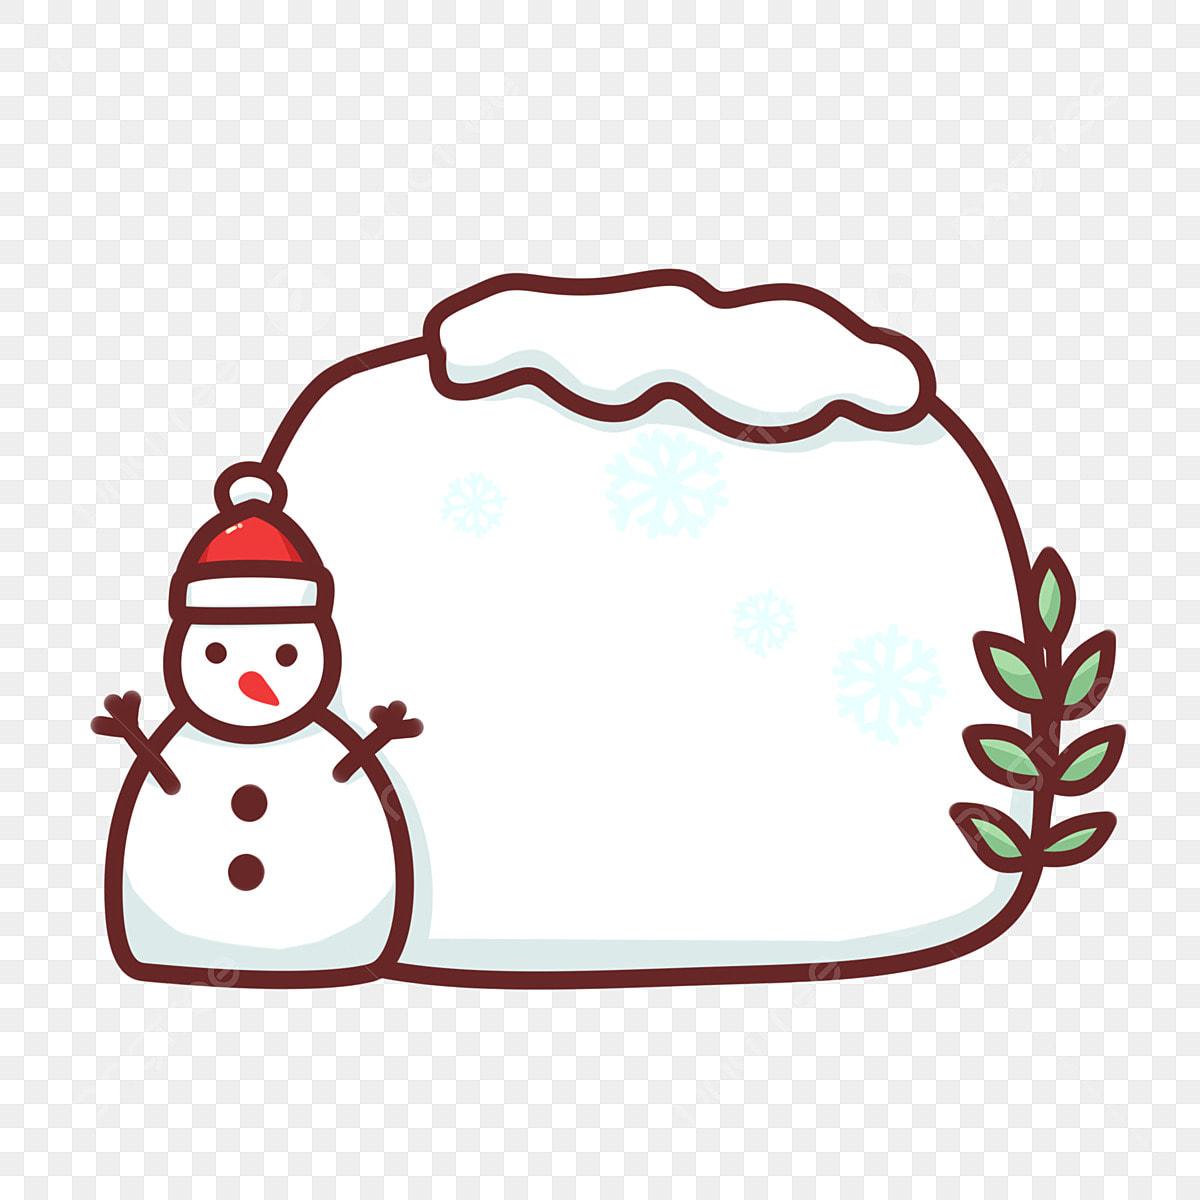 Christmas Header Transparent.Cute Minimalistic Christmas Hand Drawn Border Header